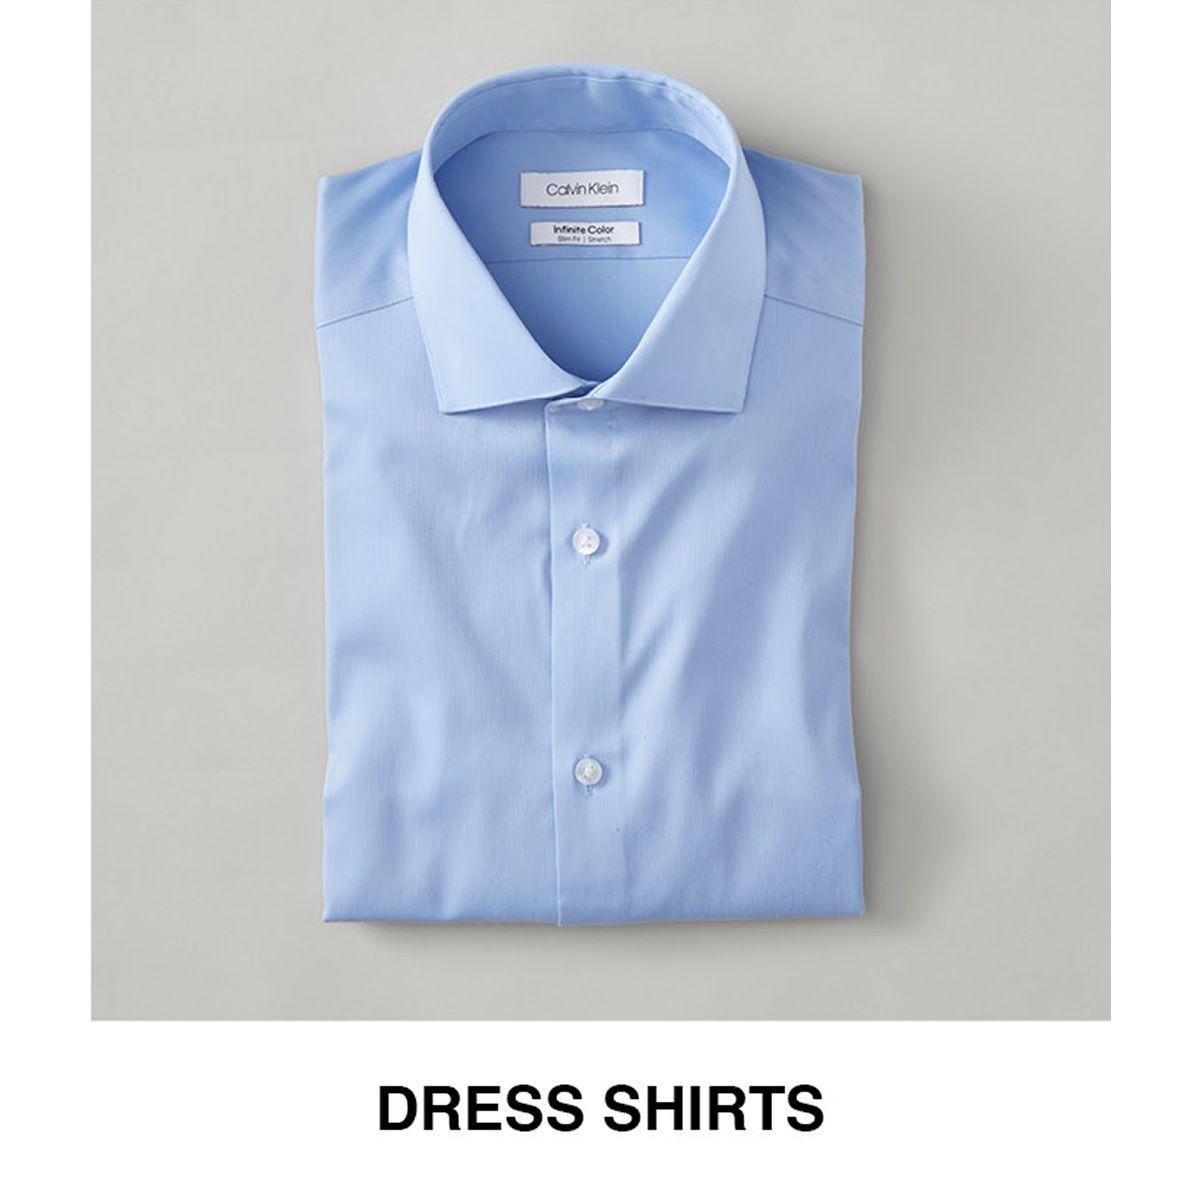 Polo Ralph Lauren Men s Shirts - Macy s 176ff50c157